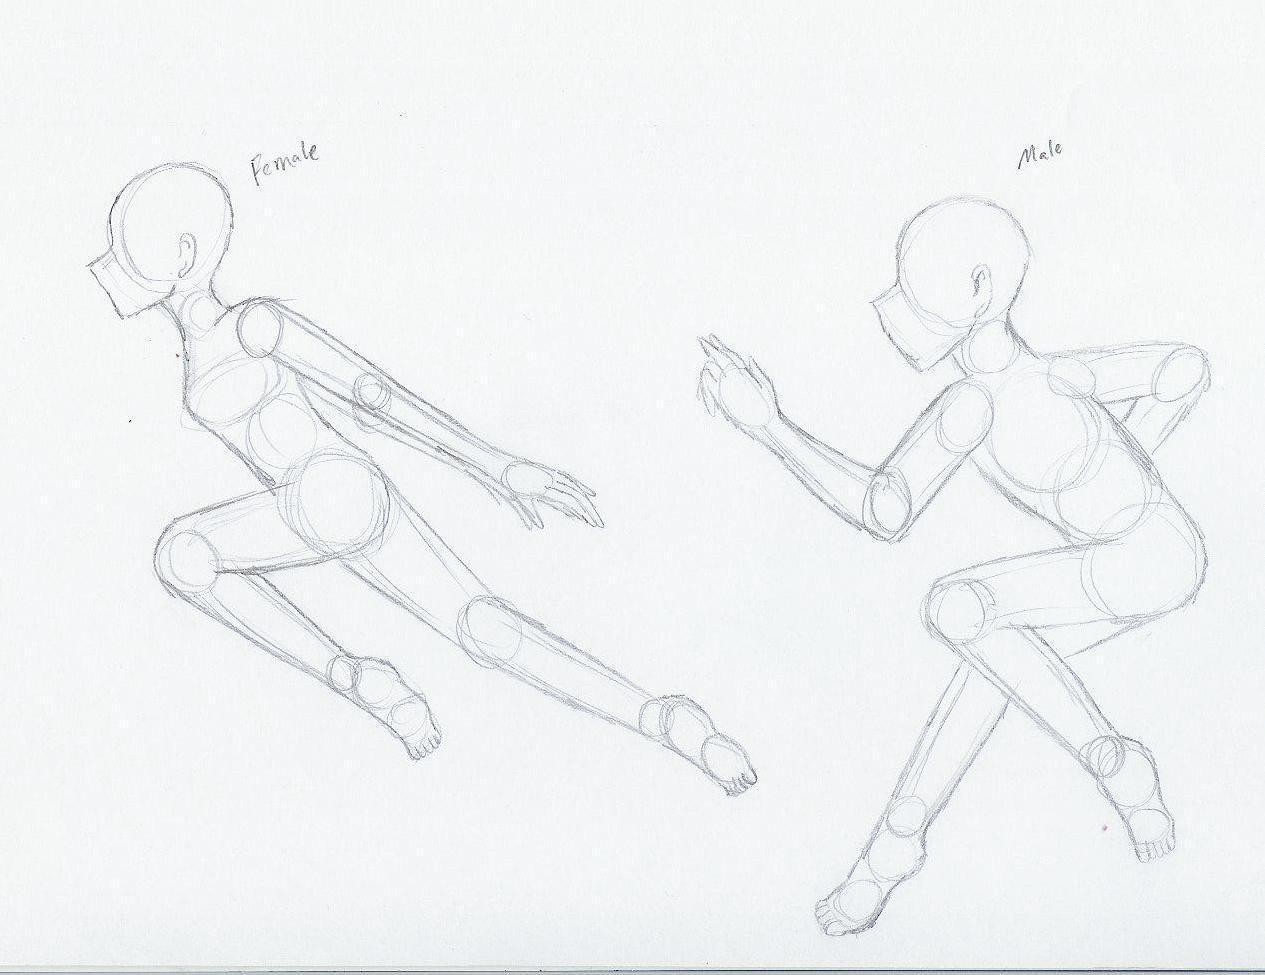 ninja body frames m and f by Zalia13 on DeviantArt